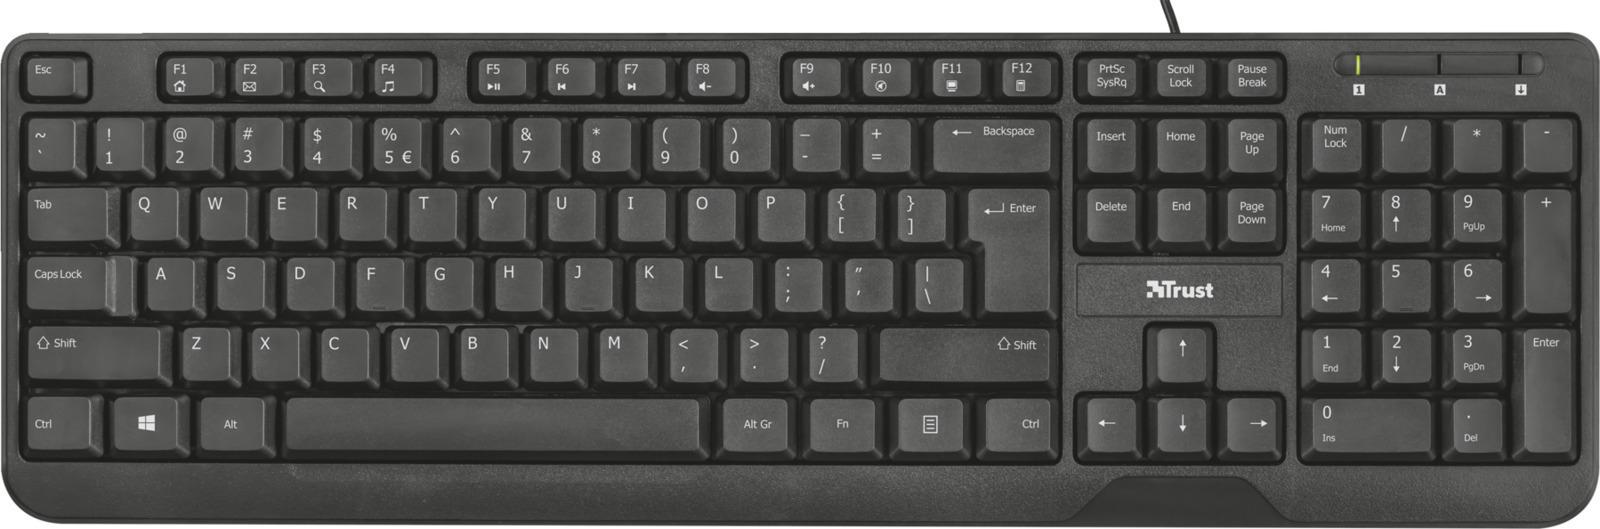 Trust Ziva Multimedia GR Keyboard  (22177) - Πληρωμή και σε έως 36 Δόσεις!!!